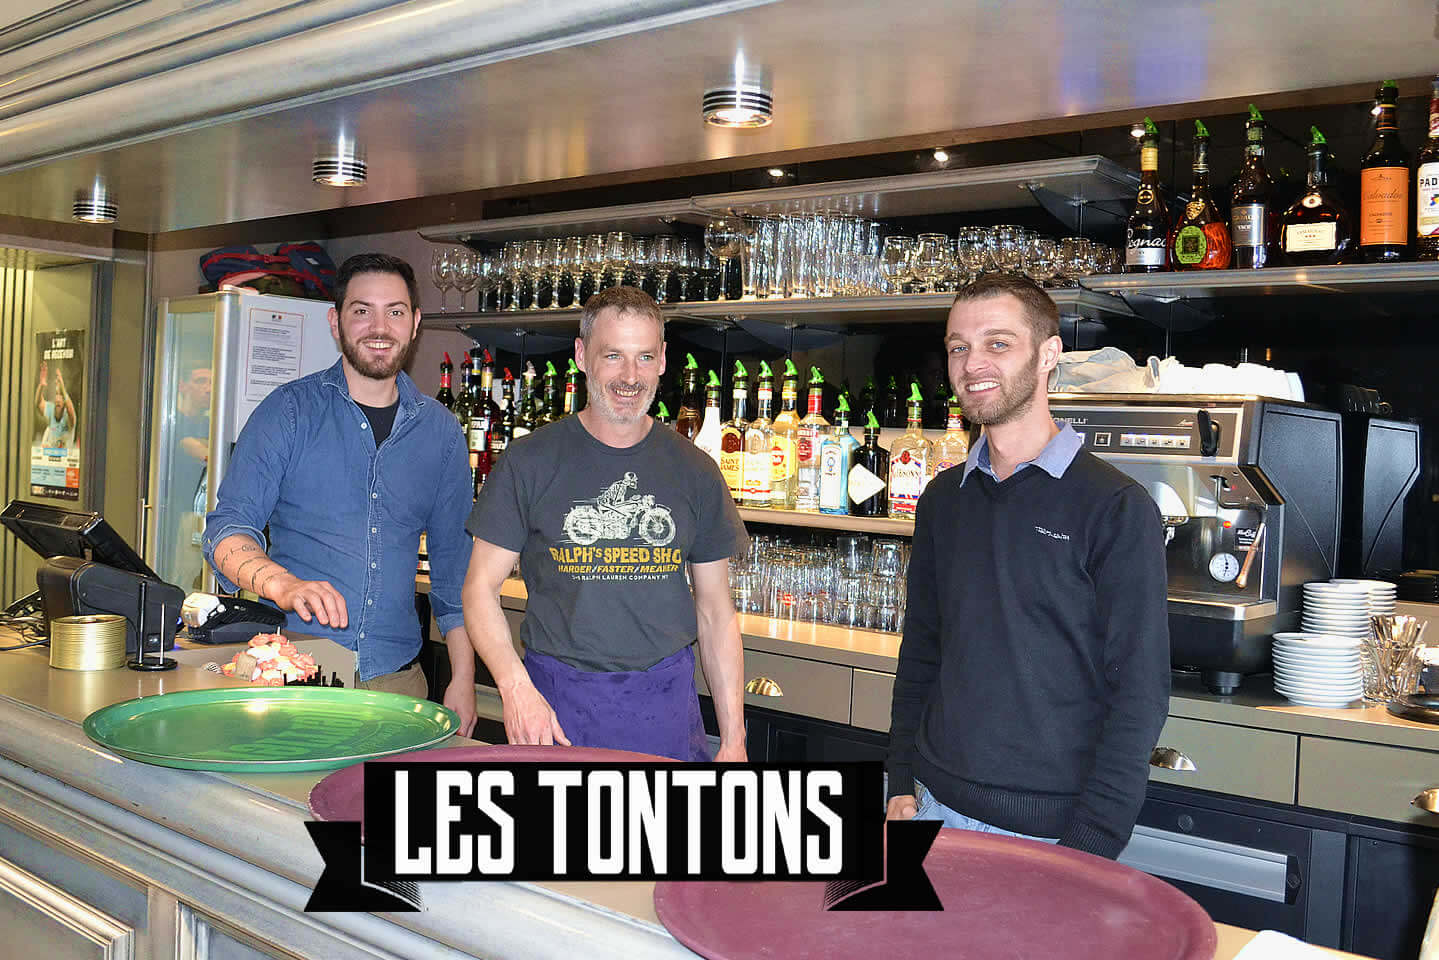 Les Tontons Bayonnais